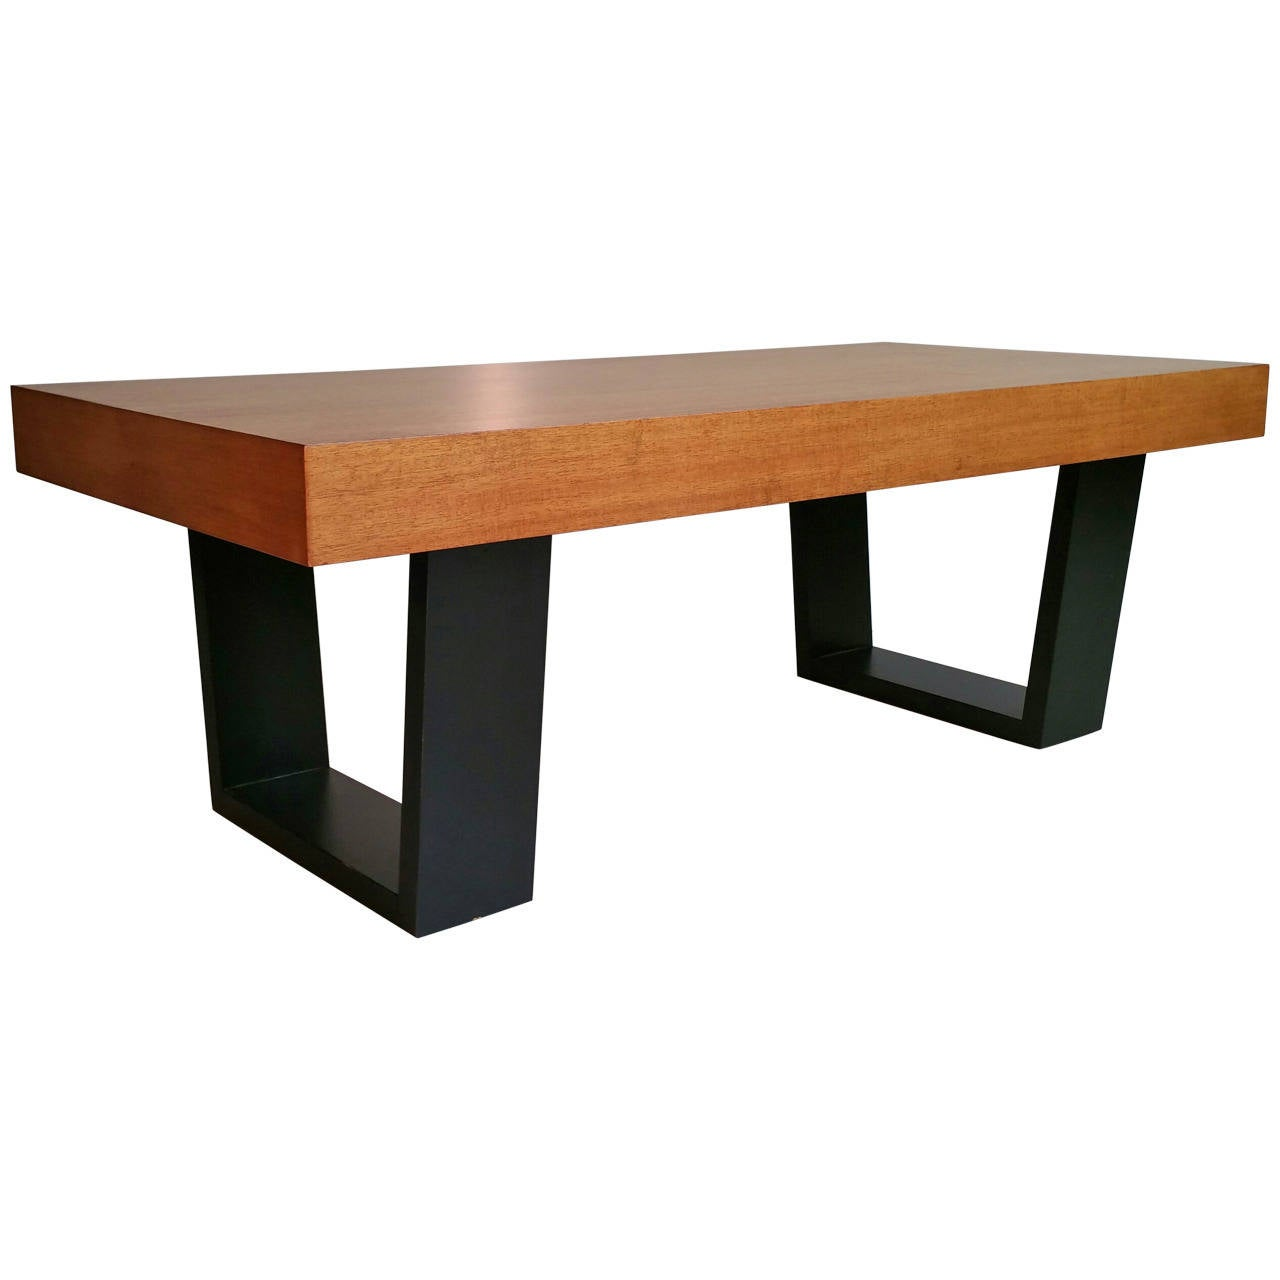 Rare Paul Frankl Coffee Table,,modernist